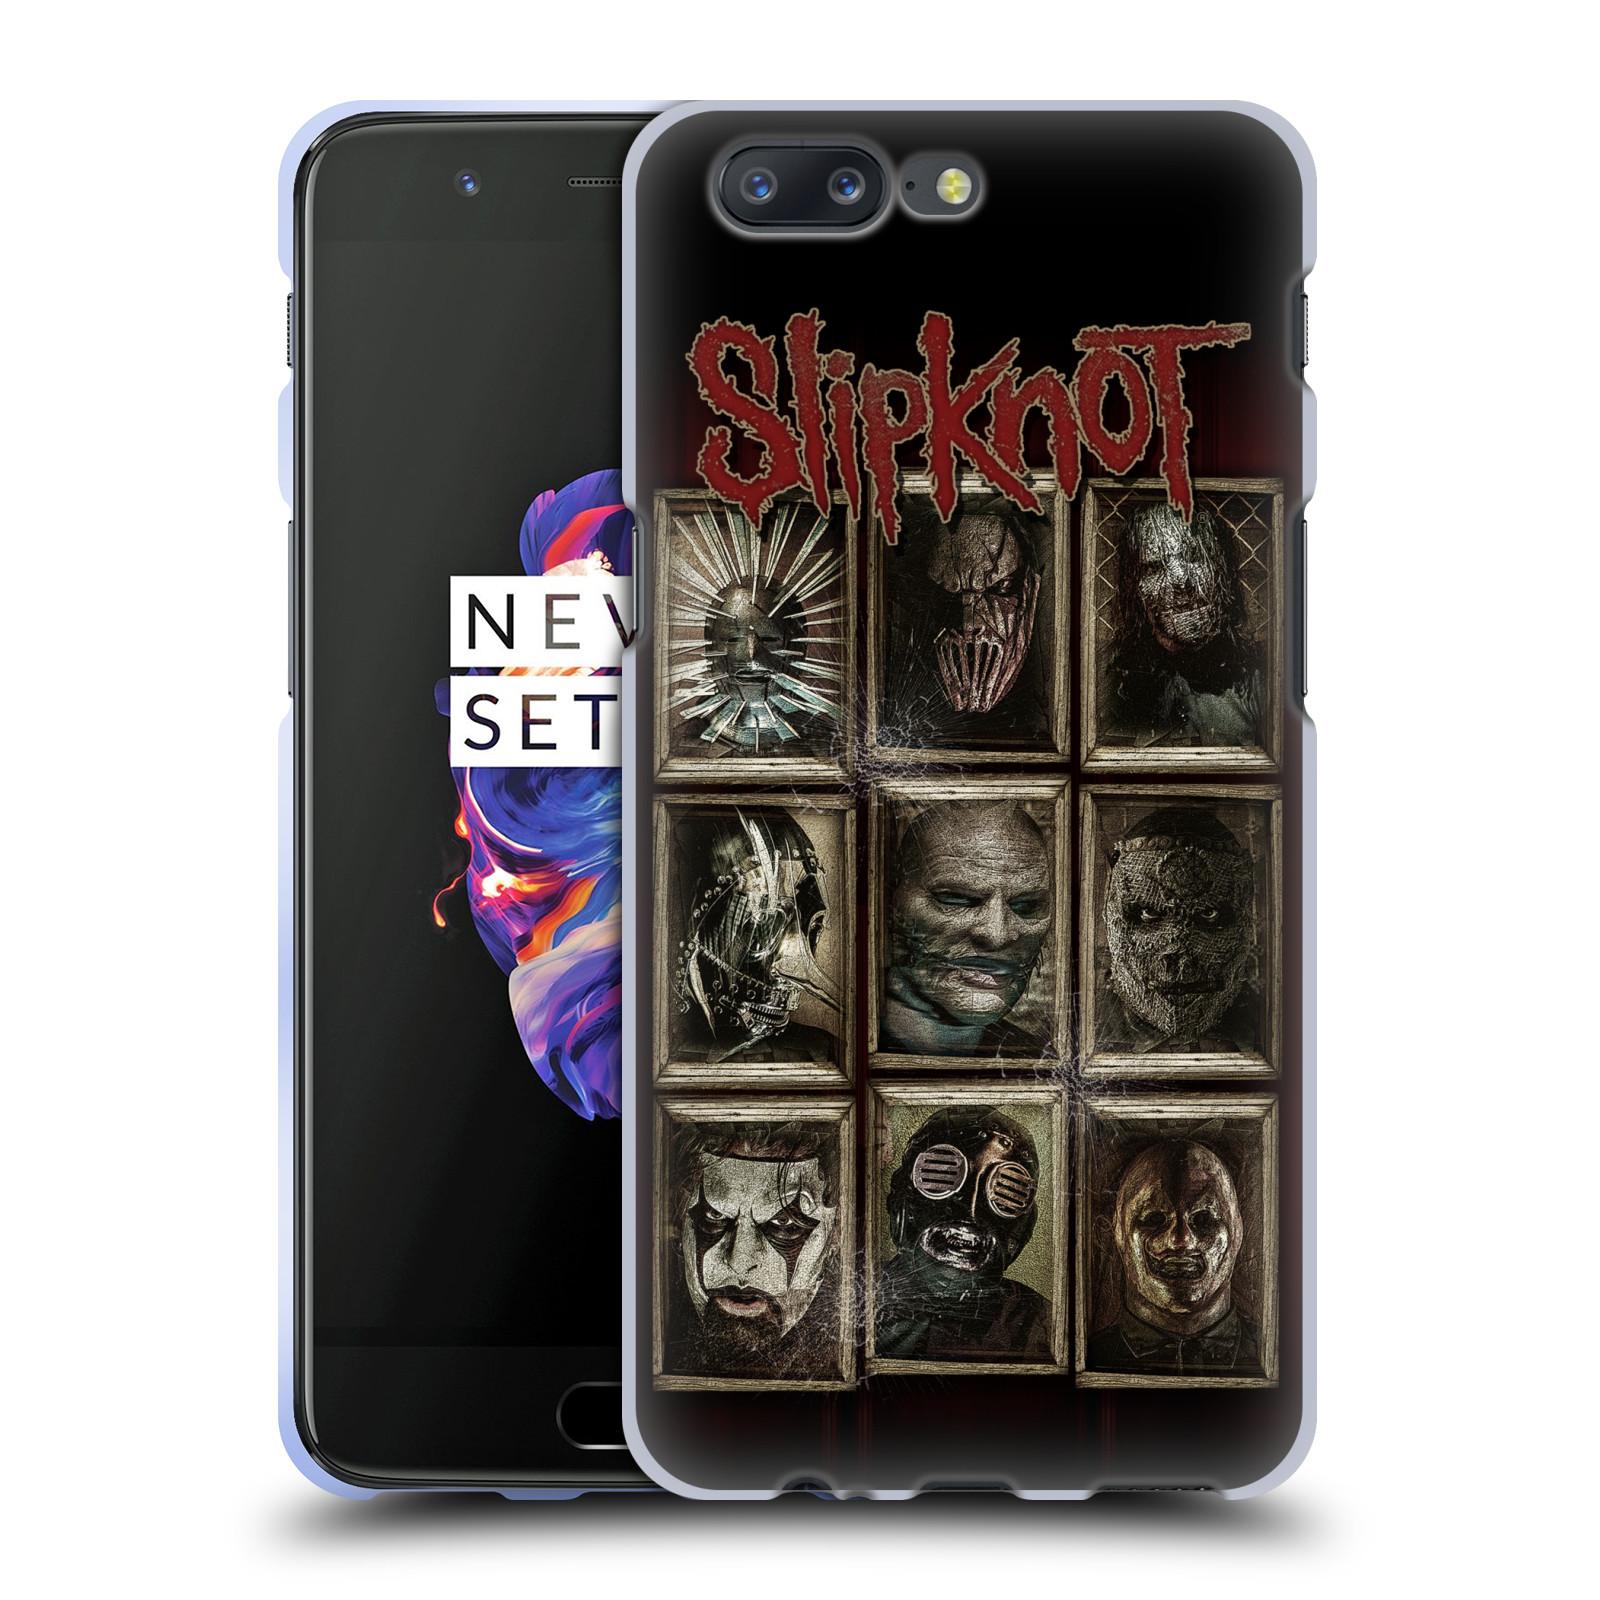 Silikonové pouzdro na mobil OnePlus 5 - Head Case - Slipknot - Masky (Silikonový kryt či obal na mobilní telefon OnePlus 5 s motivem Slipknot - Masky)